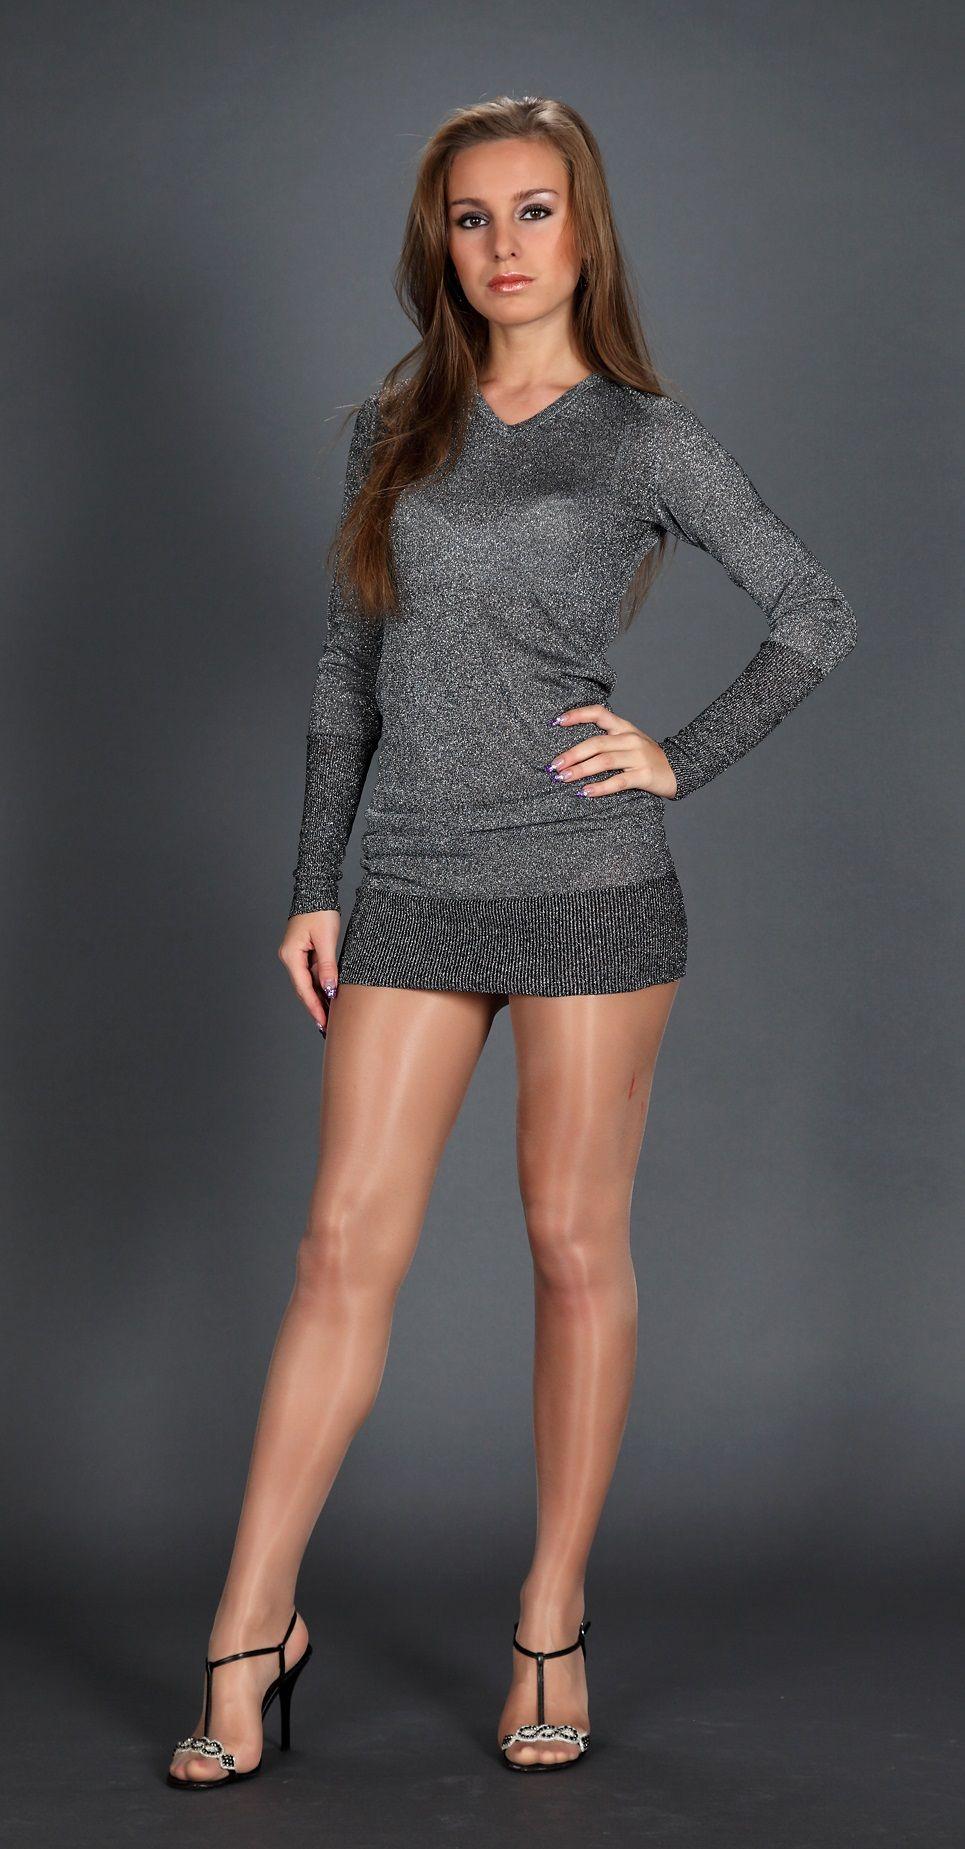 Hard legs in pantyhose